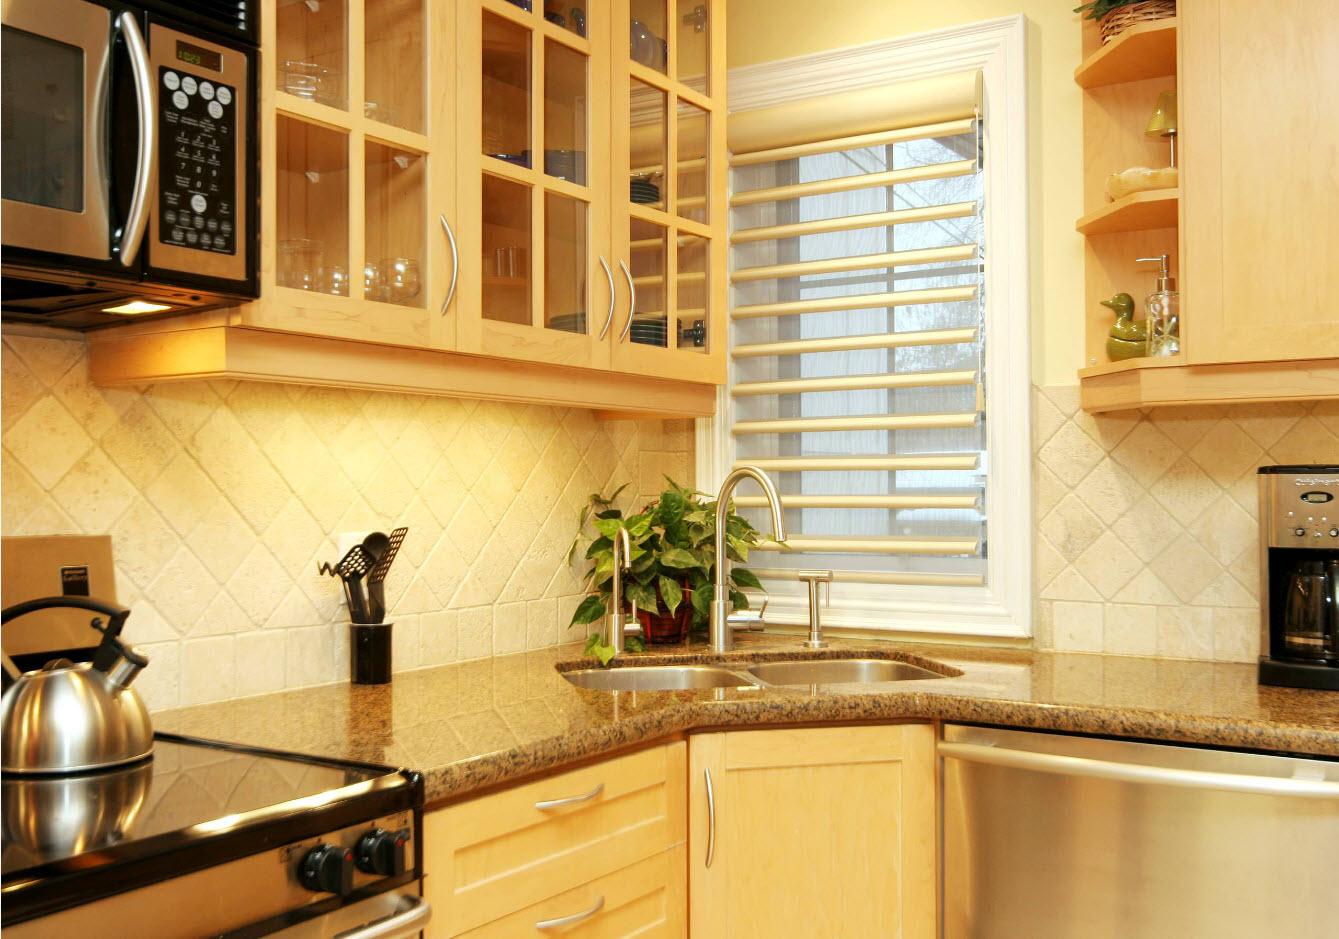 Angular Kitchen Layout Design Ideas 2017. Nice roman blinds at the window